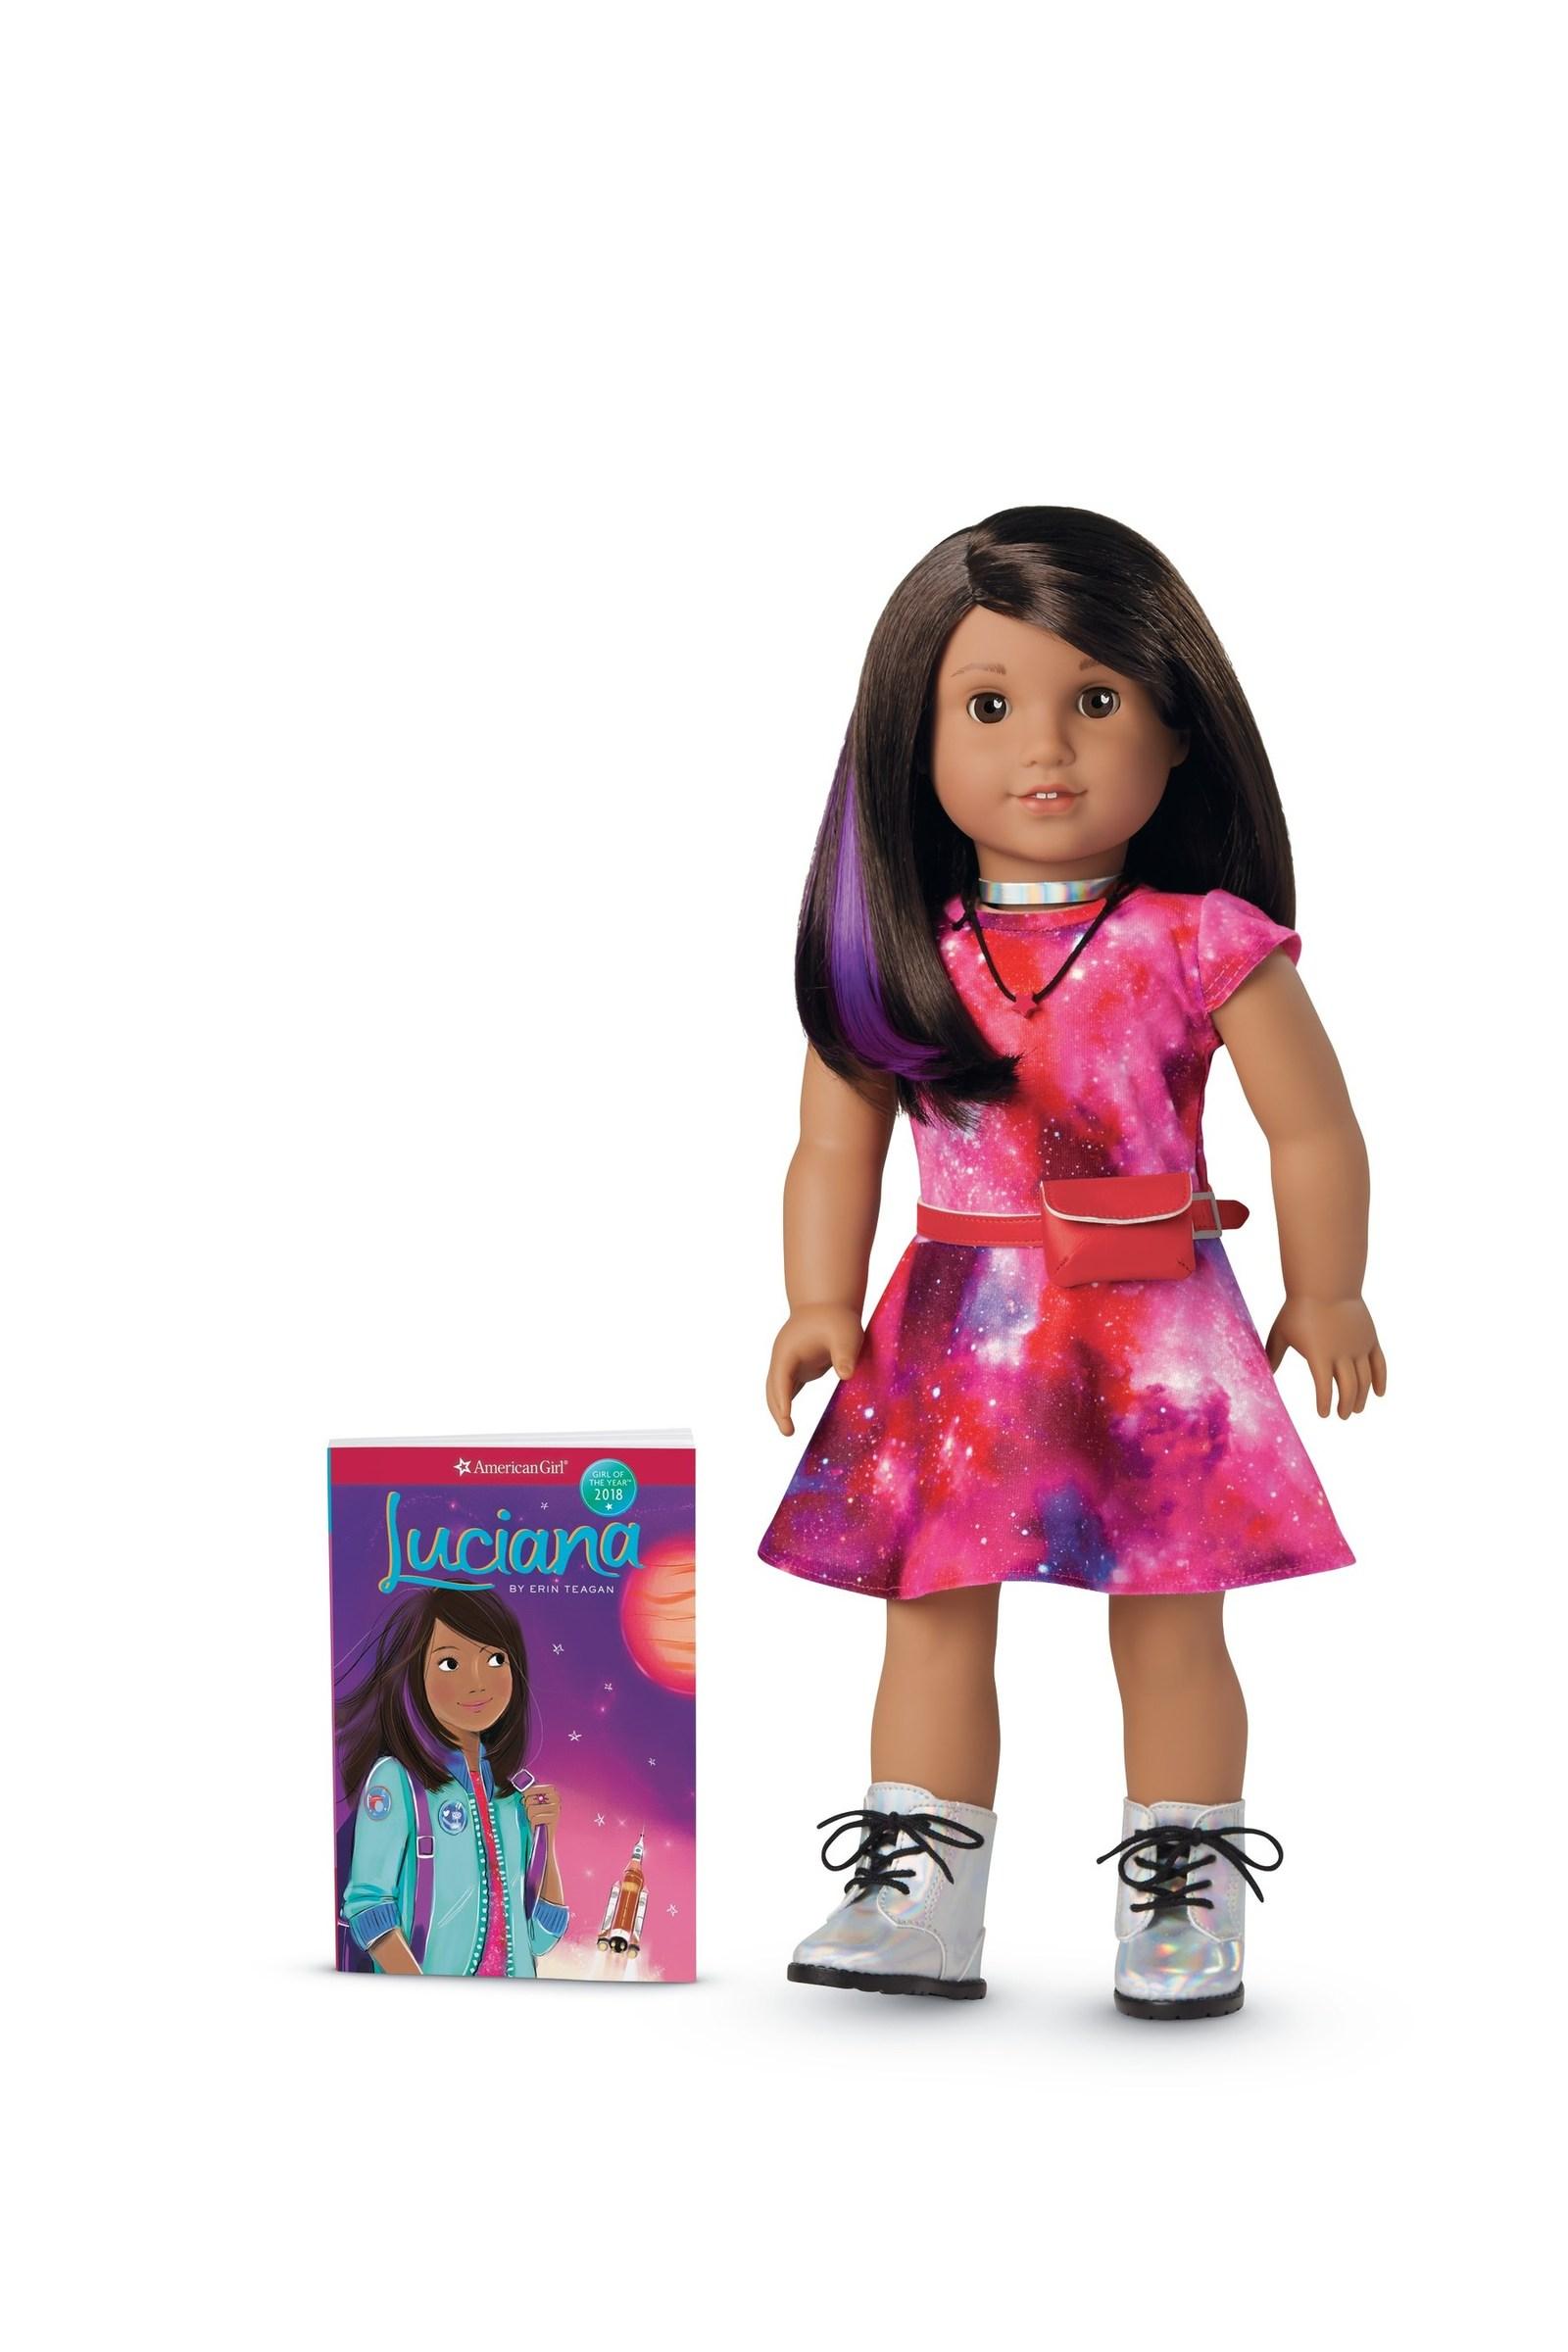 Luciana Vega American Girl Doll Videos